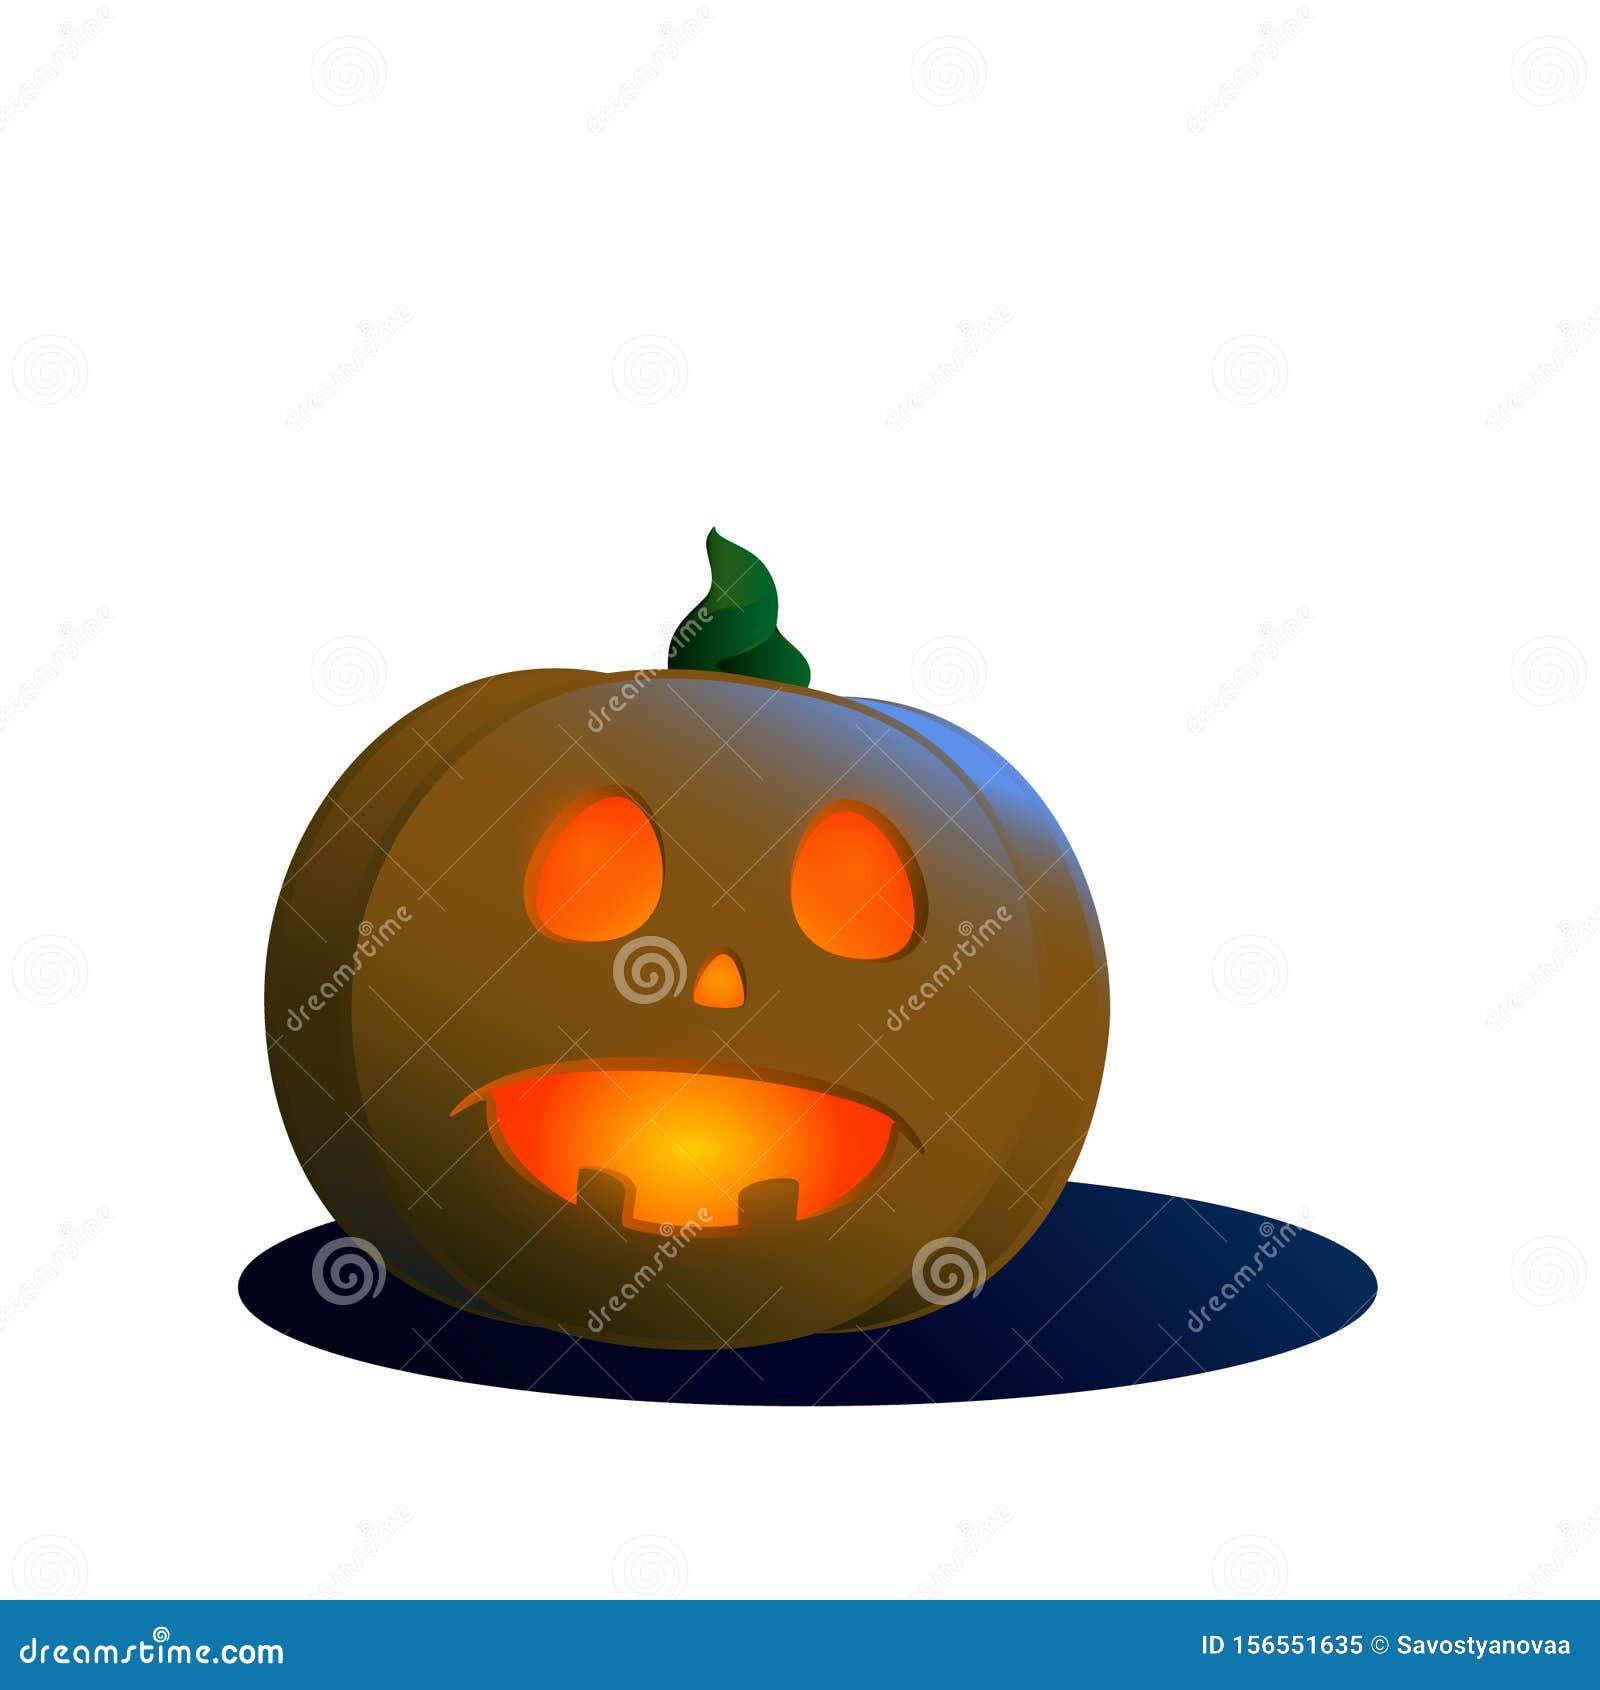 Funny Pumpkin Faces For Halloween Stock Illustration Illustration Of Beauty Element 156551635